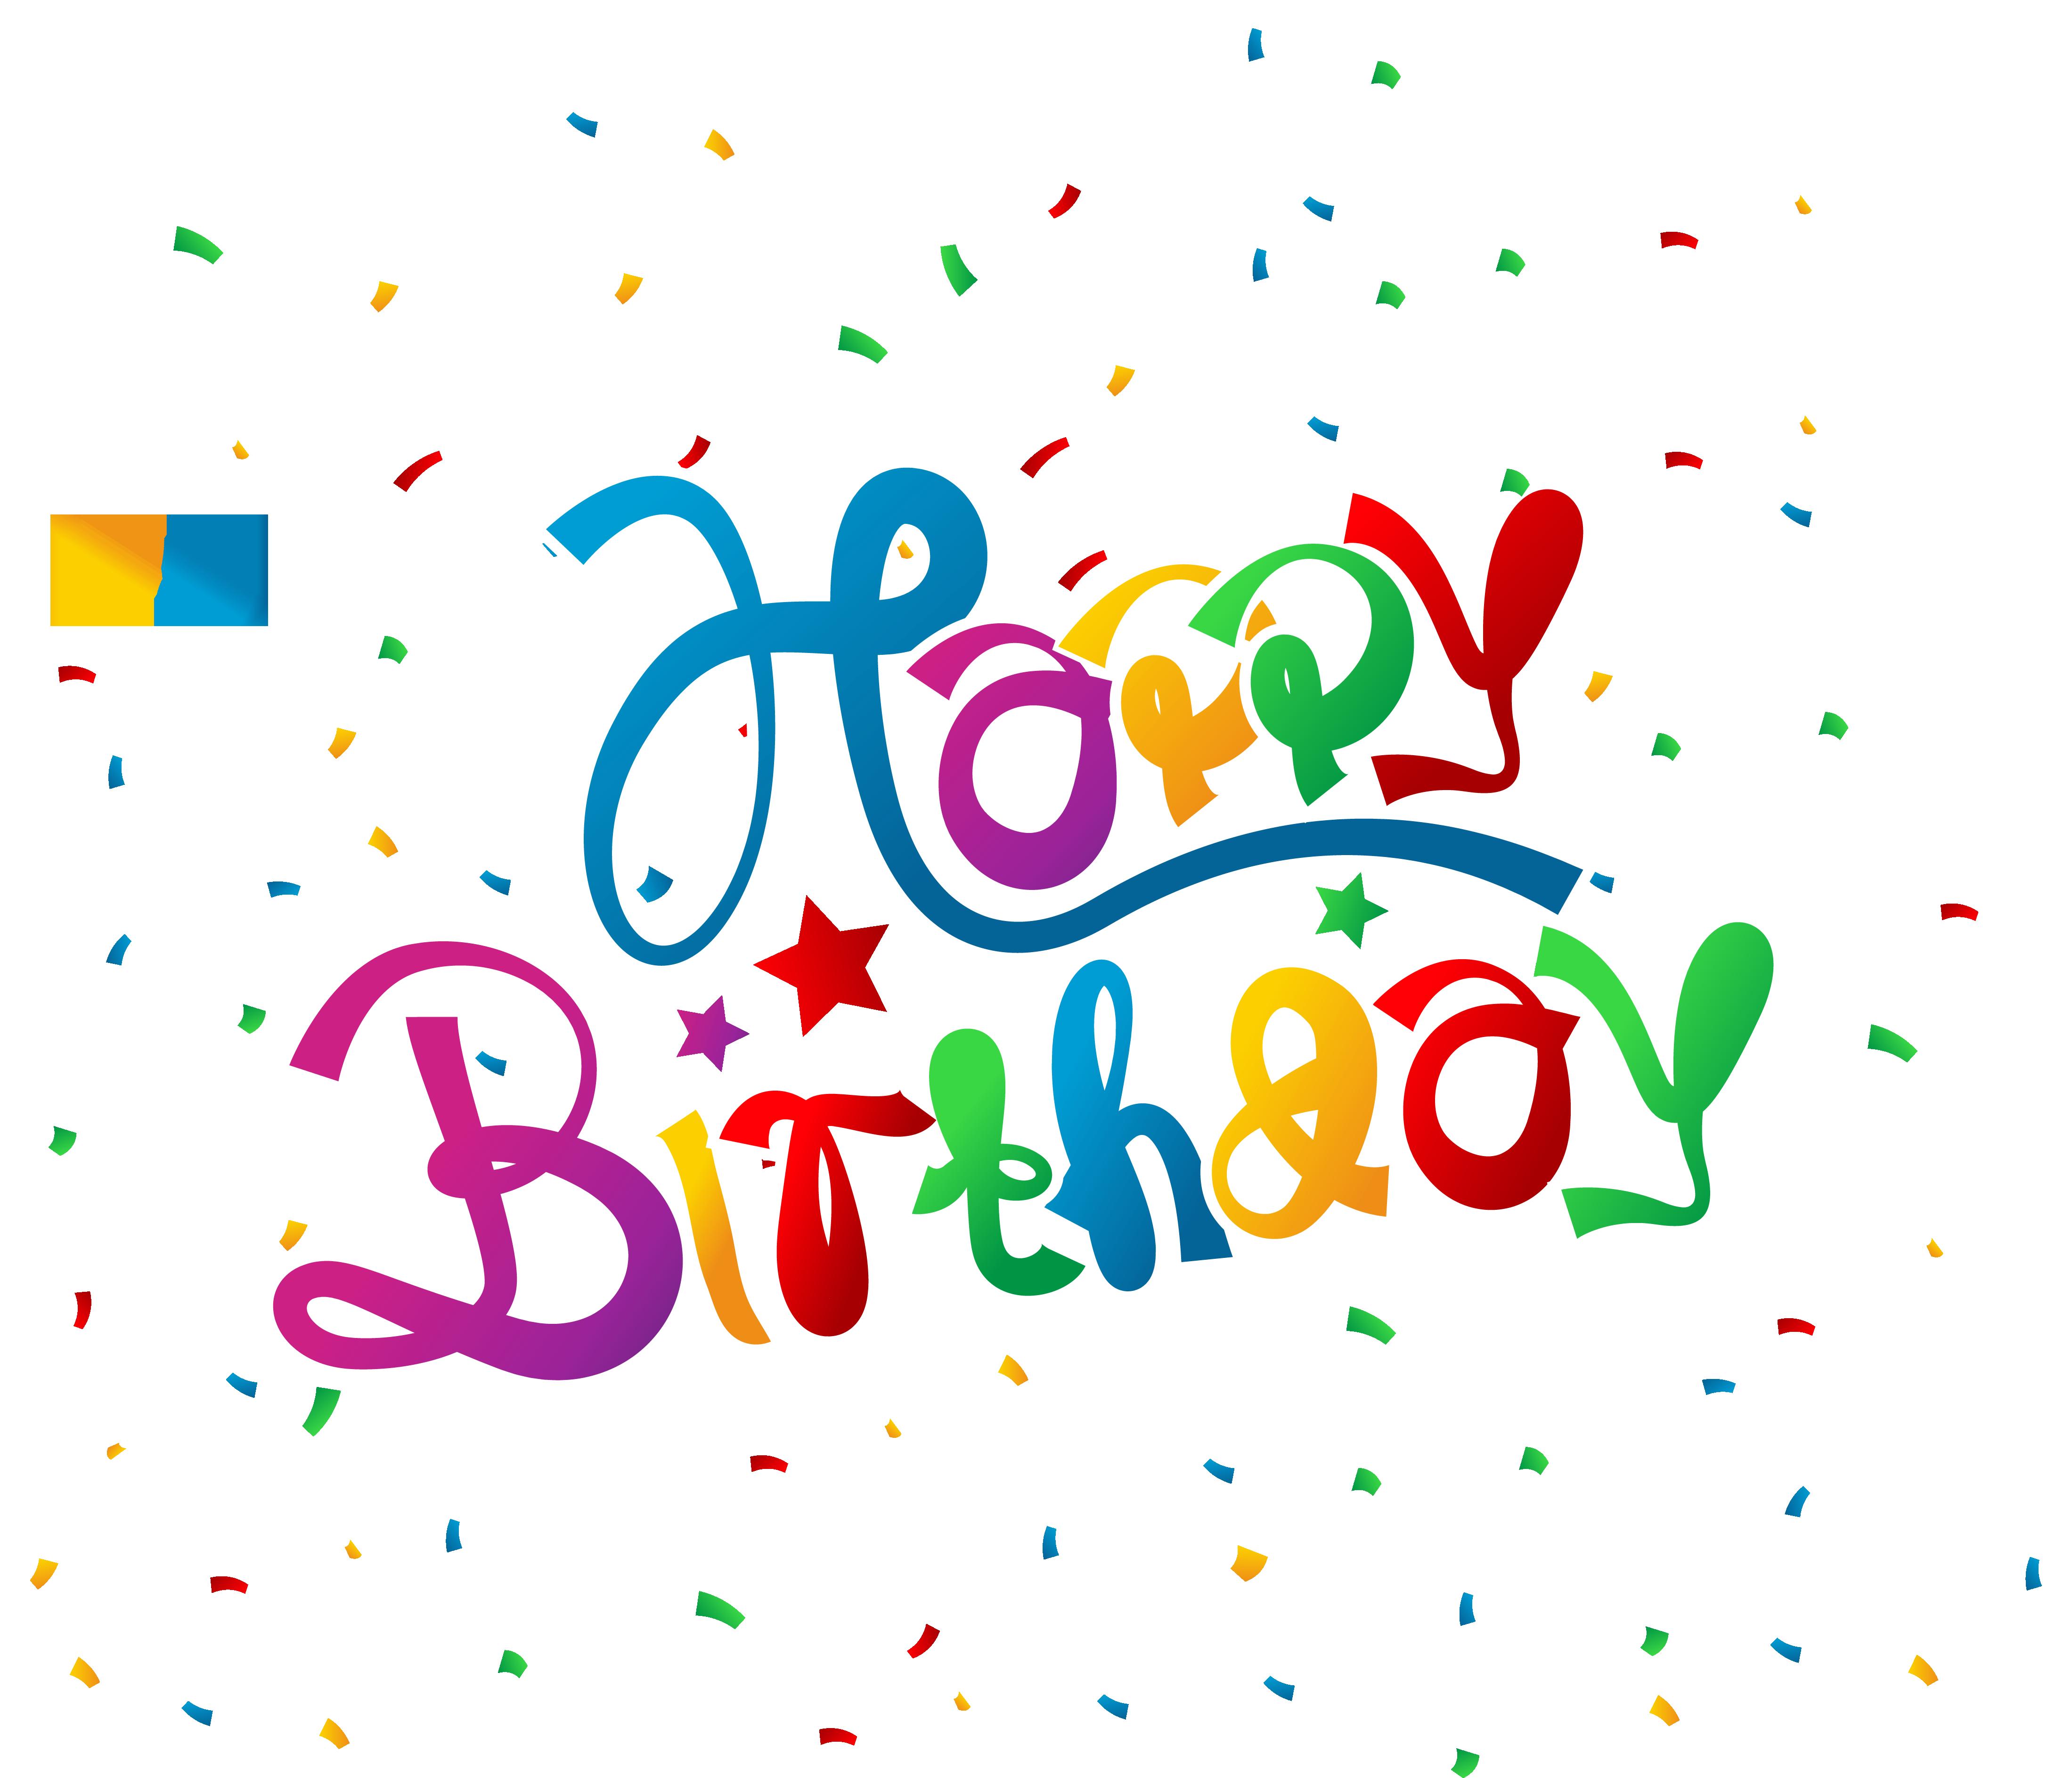 4398x3774 Happy Birthday With Confetti Clipart Picture 5